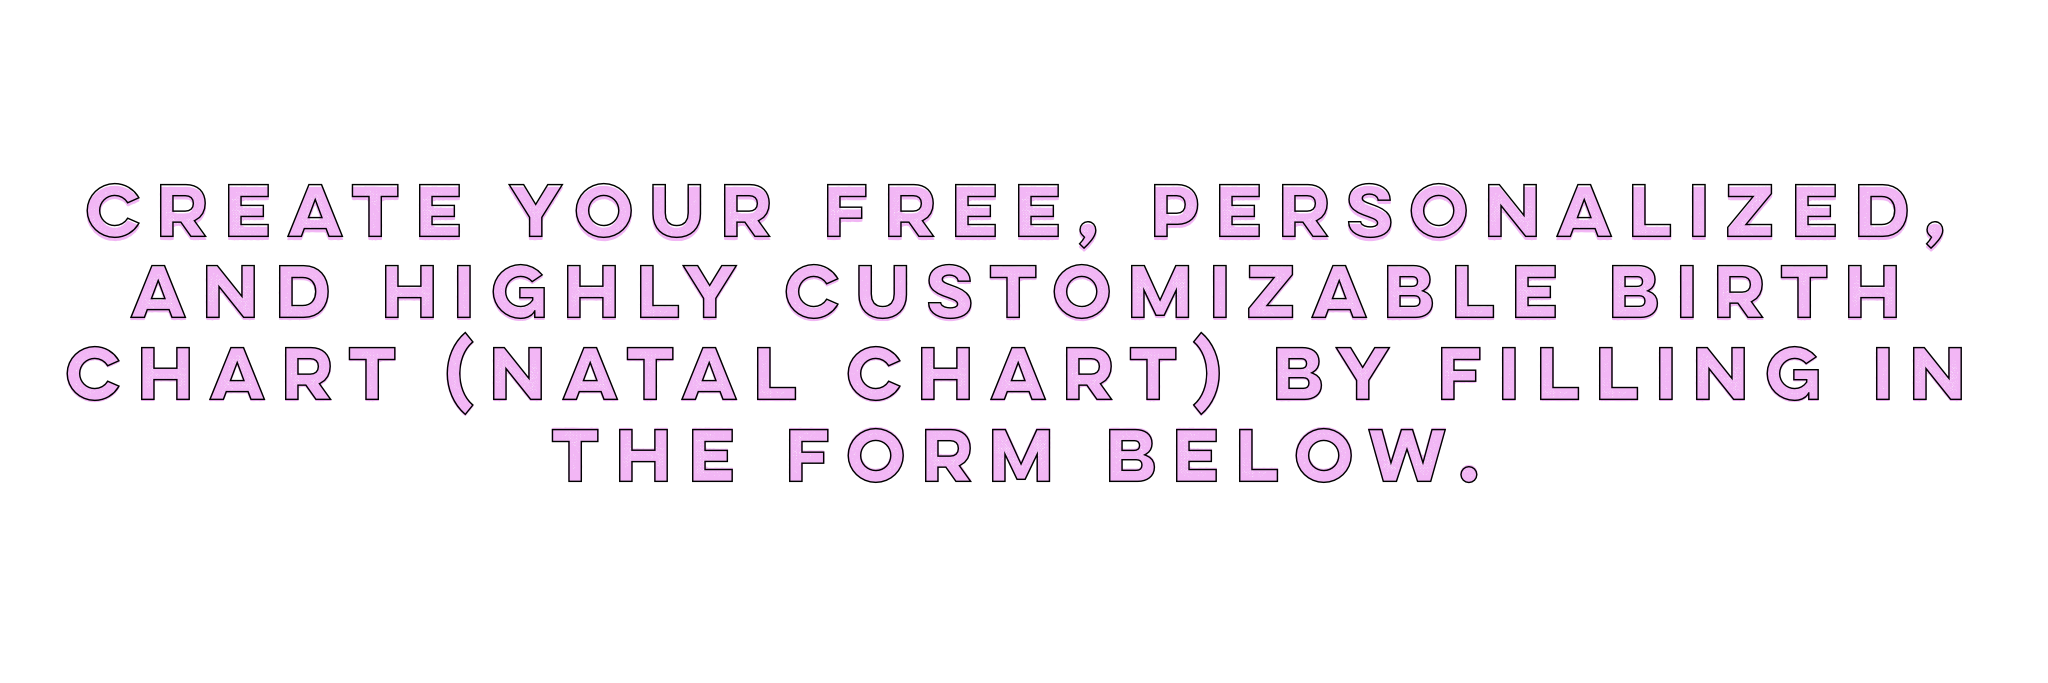 Create Free Birth Chart